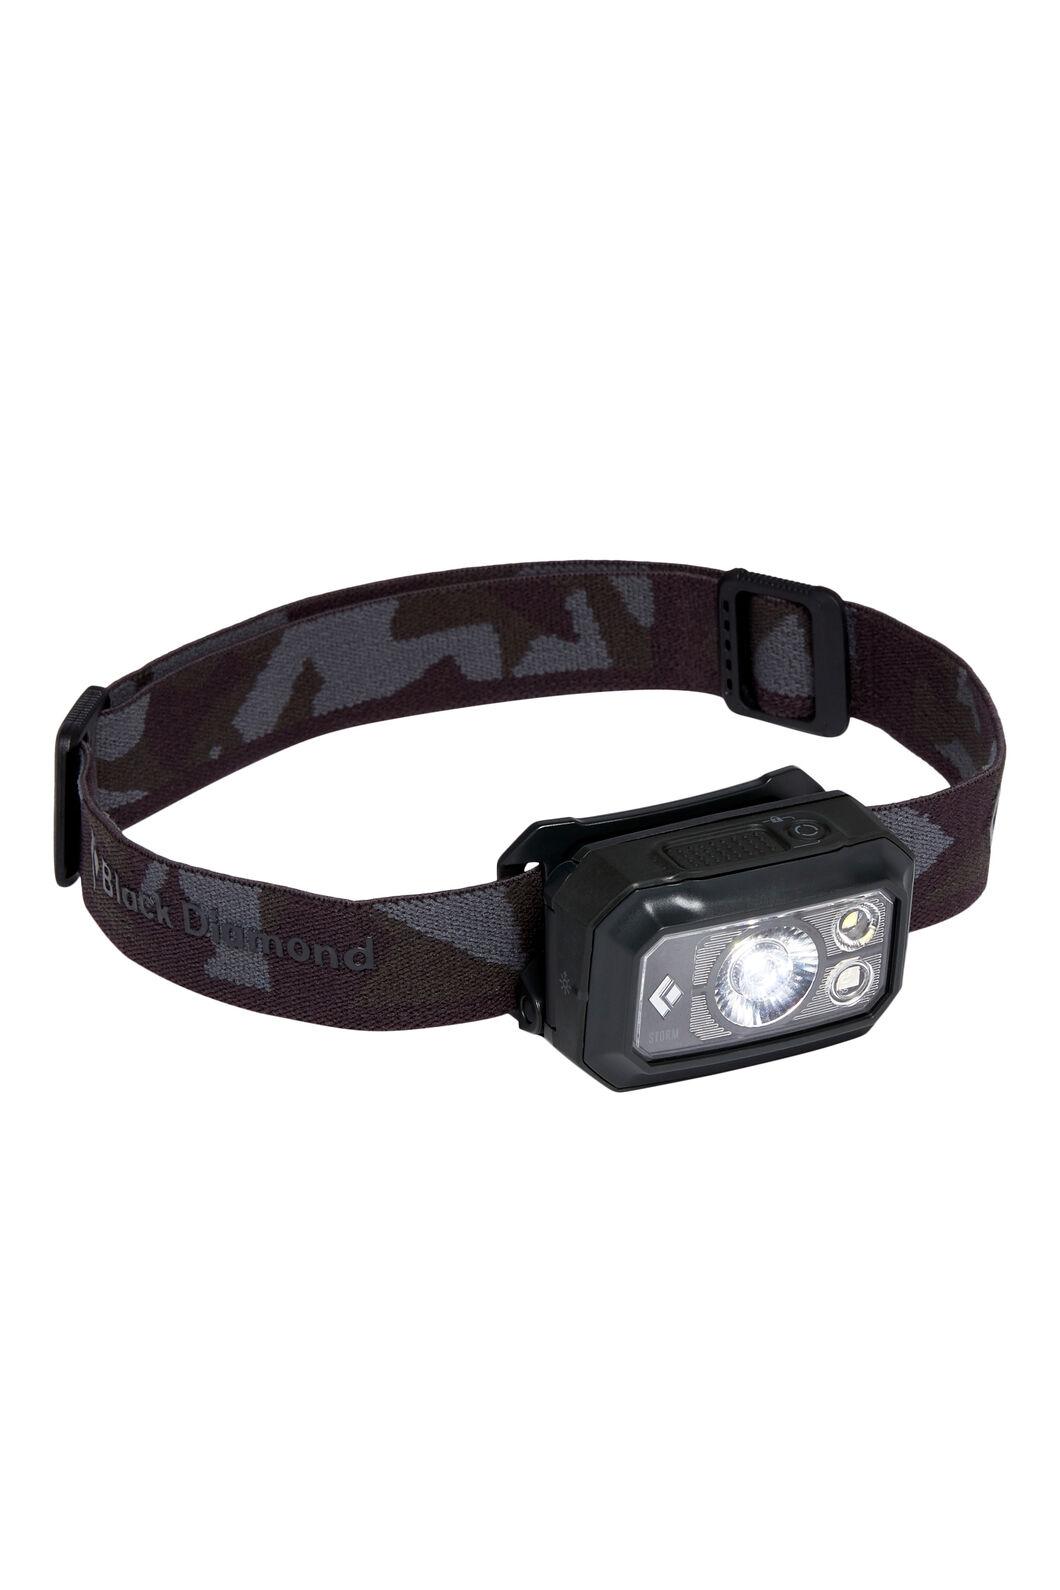 Black Diamond Storm 400 Headlamp, Black, hi-res